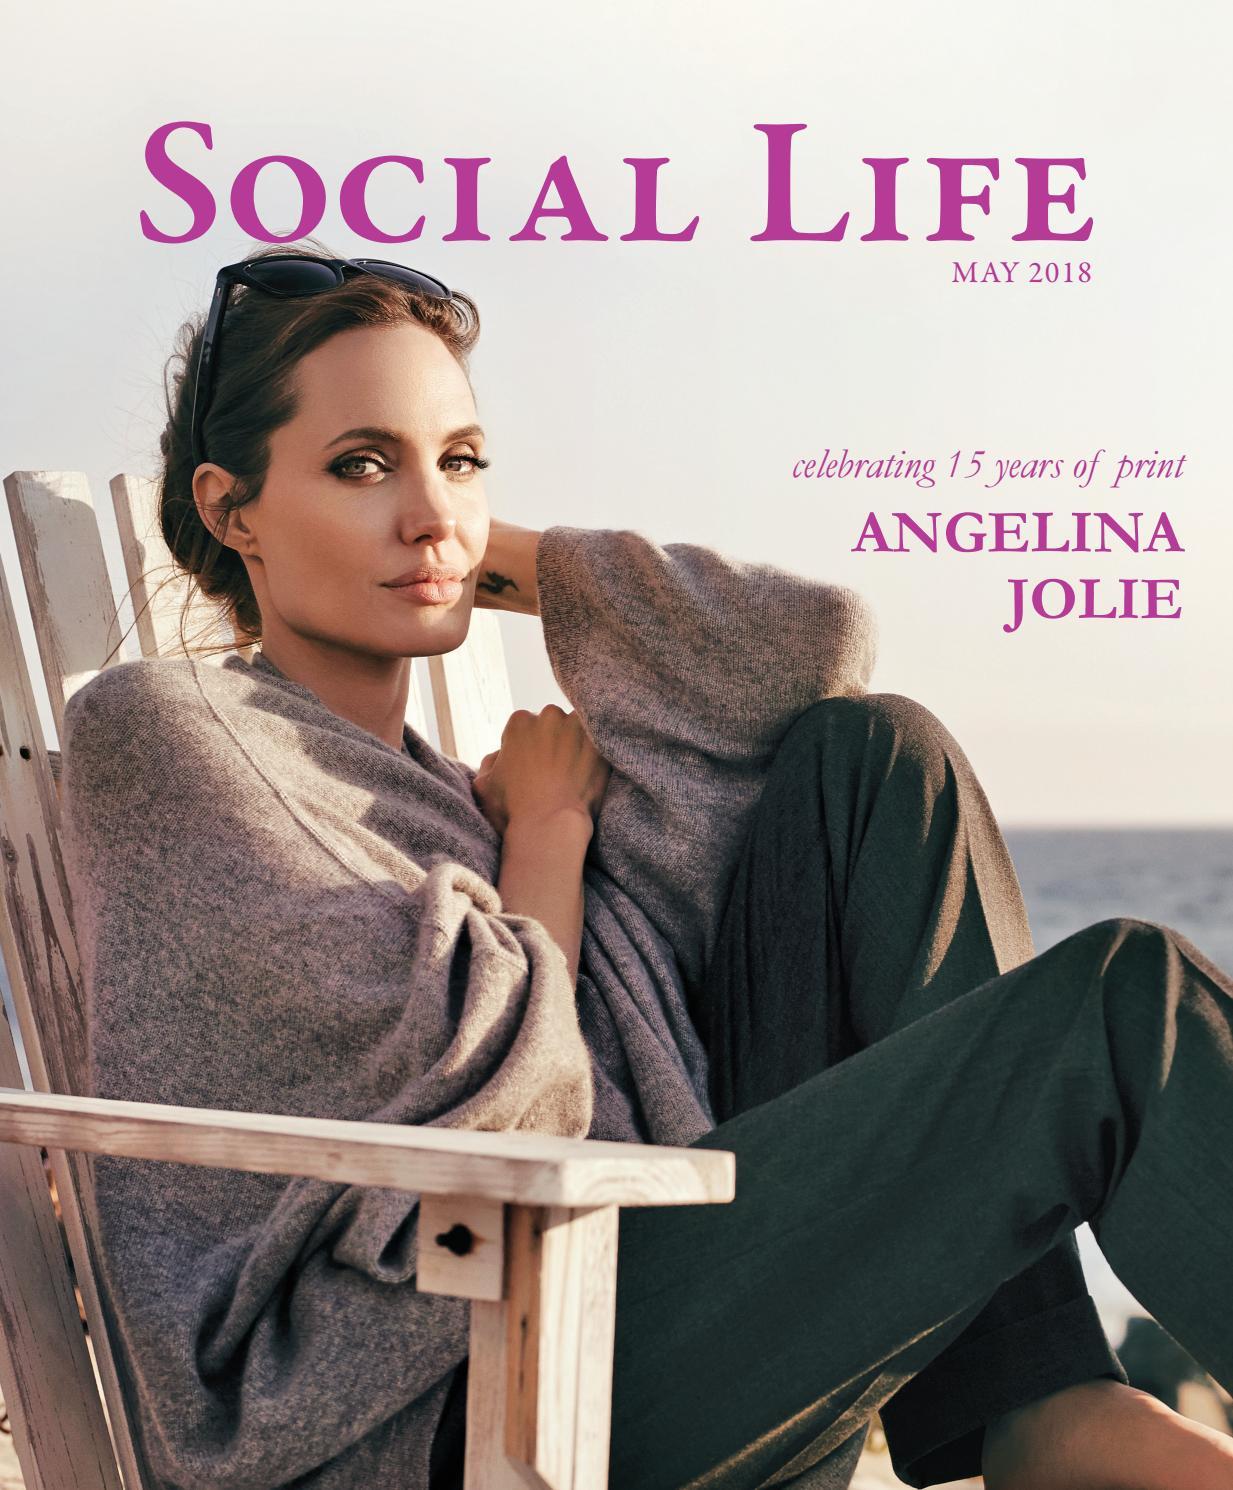 54b65f11 Social Life - May 2018 - Angelina Jolie by Social Life Magazine - issuu